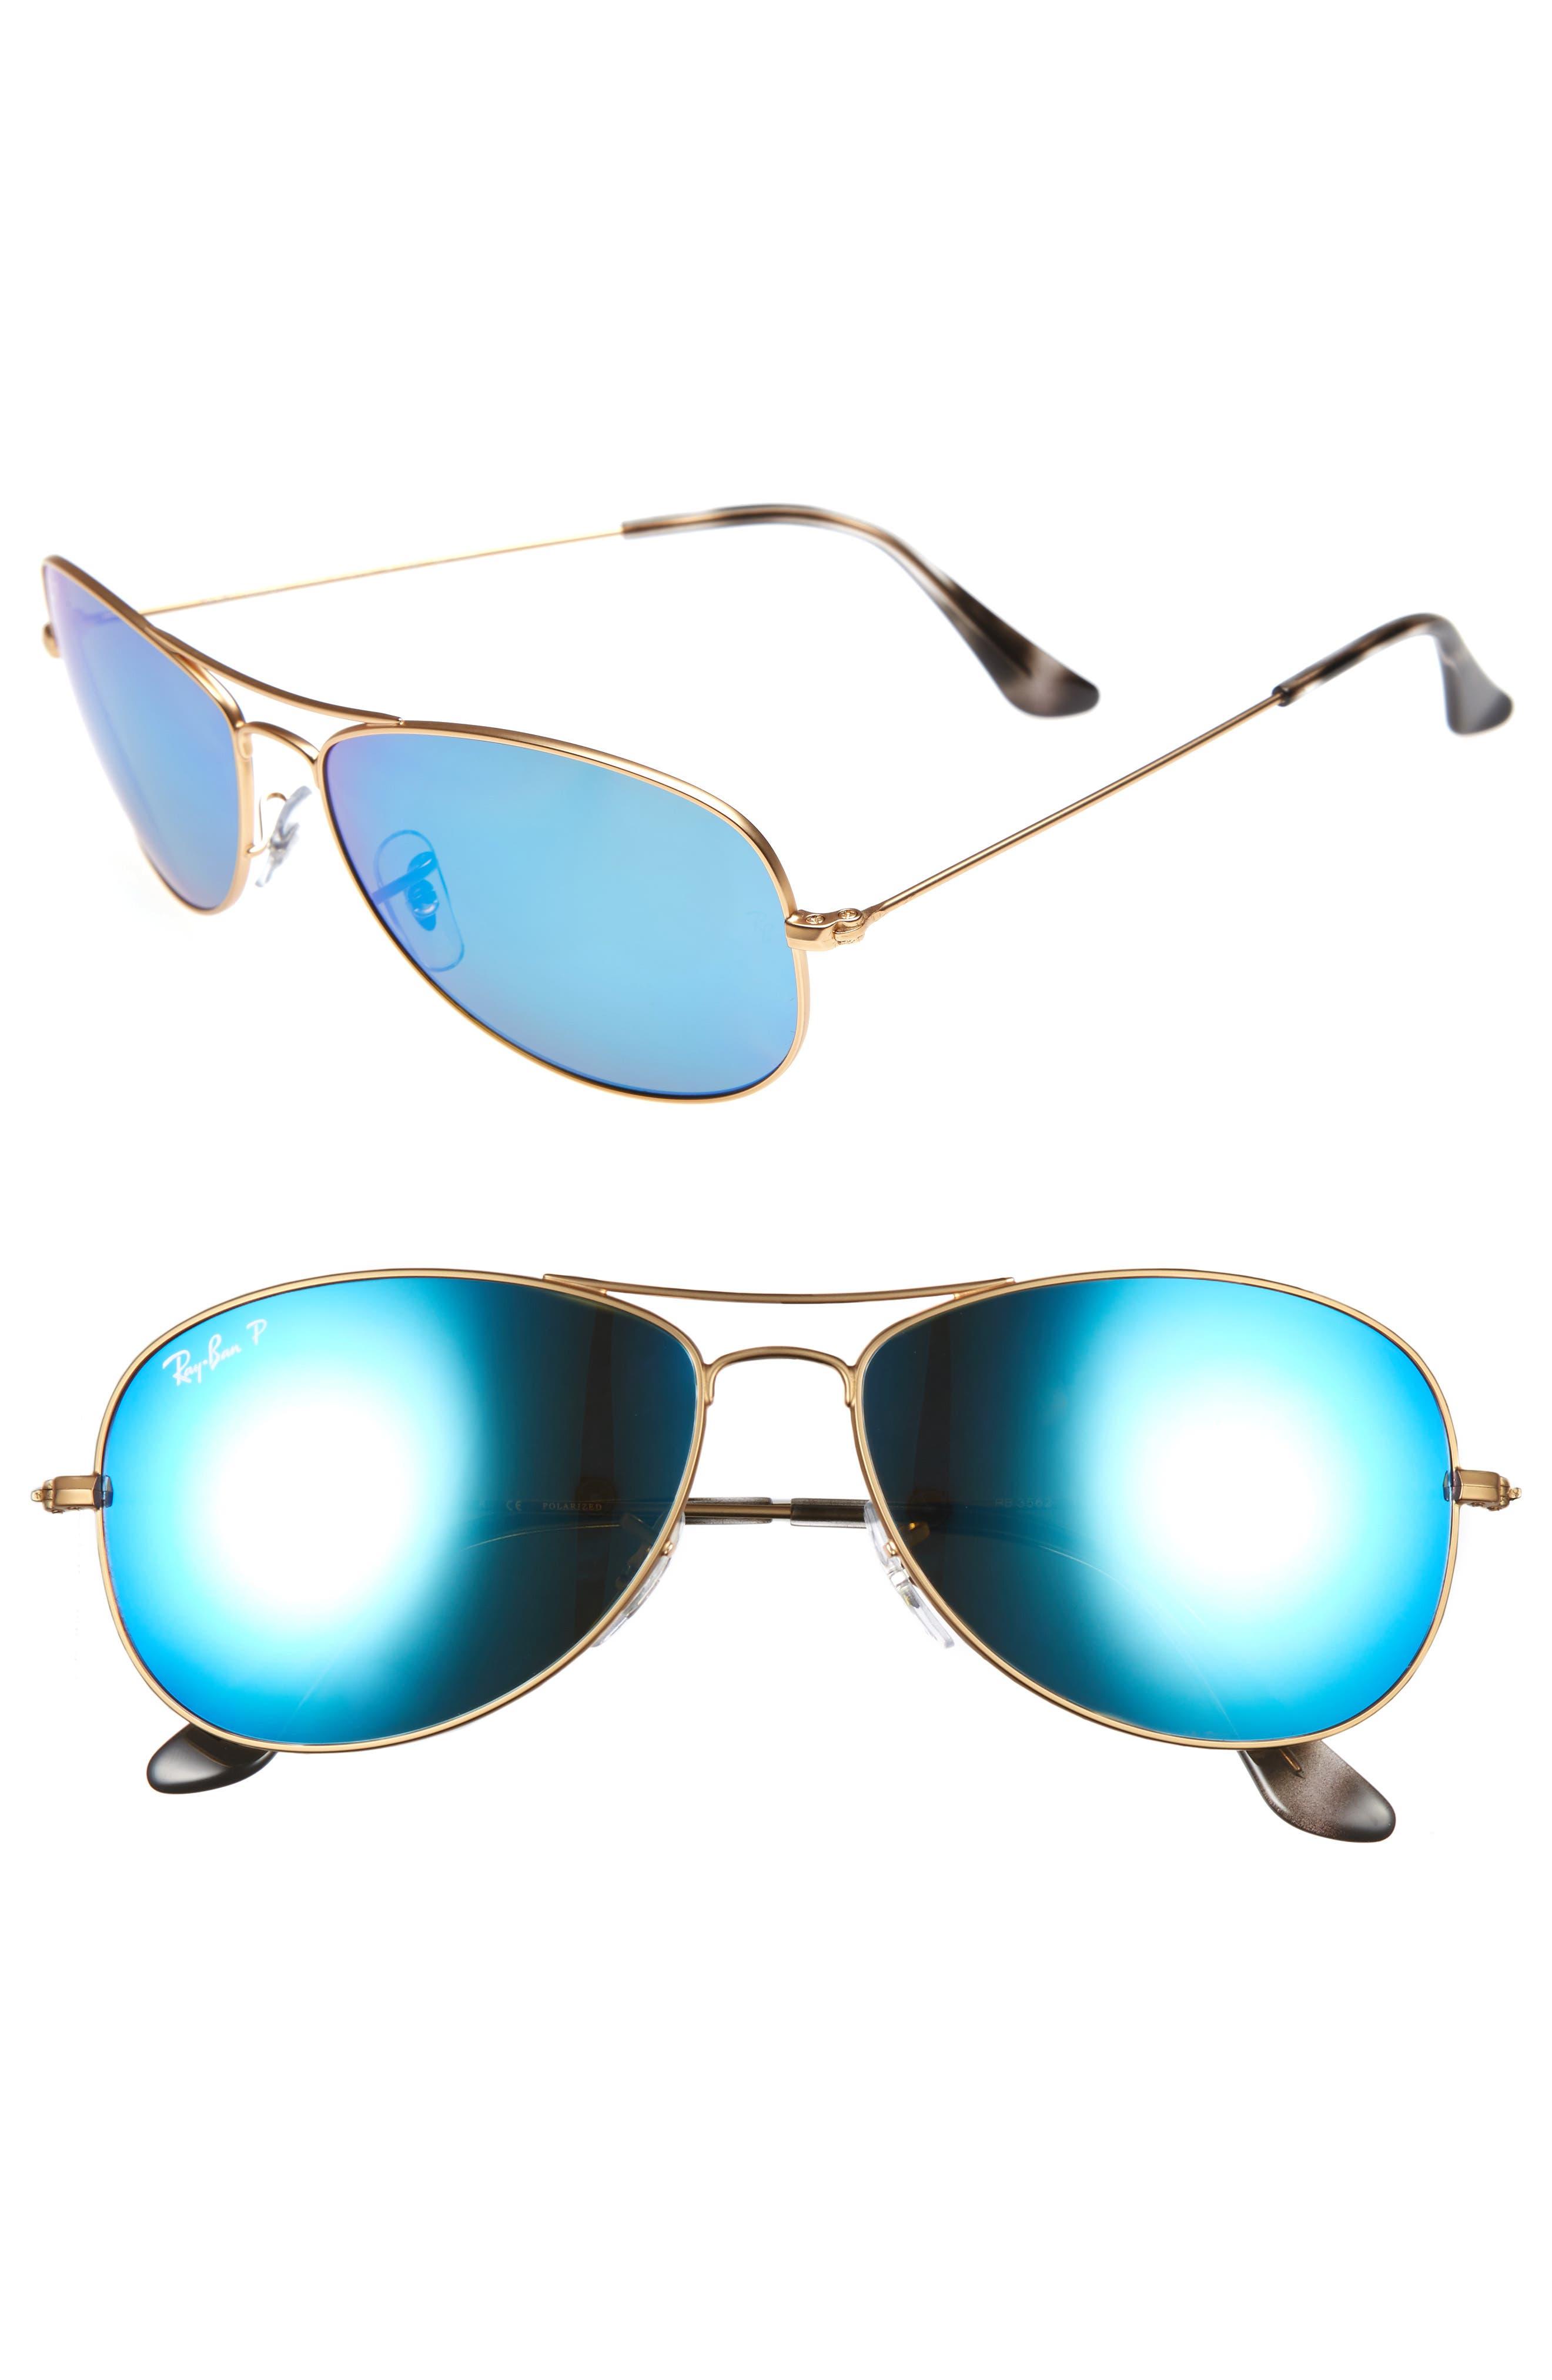 59mm Chromance Aviator Sunglasses,                             Main thumbnail 1, color,                             GOLD/ BLUE GREEN